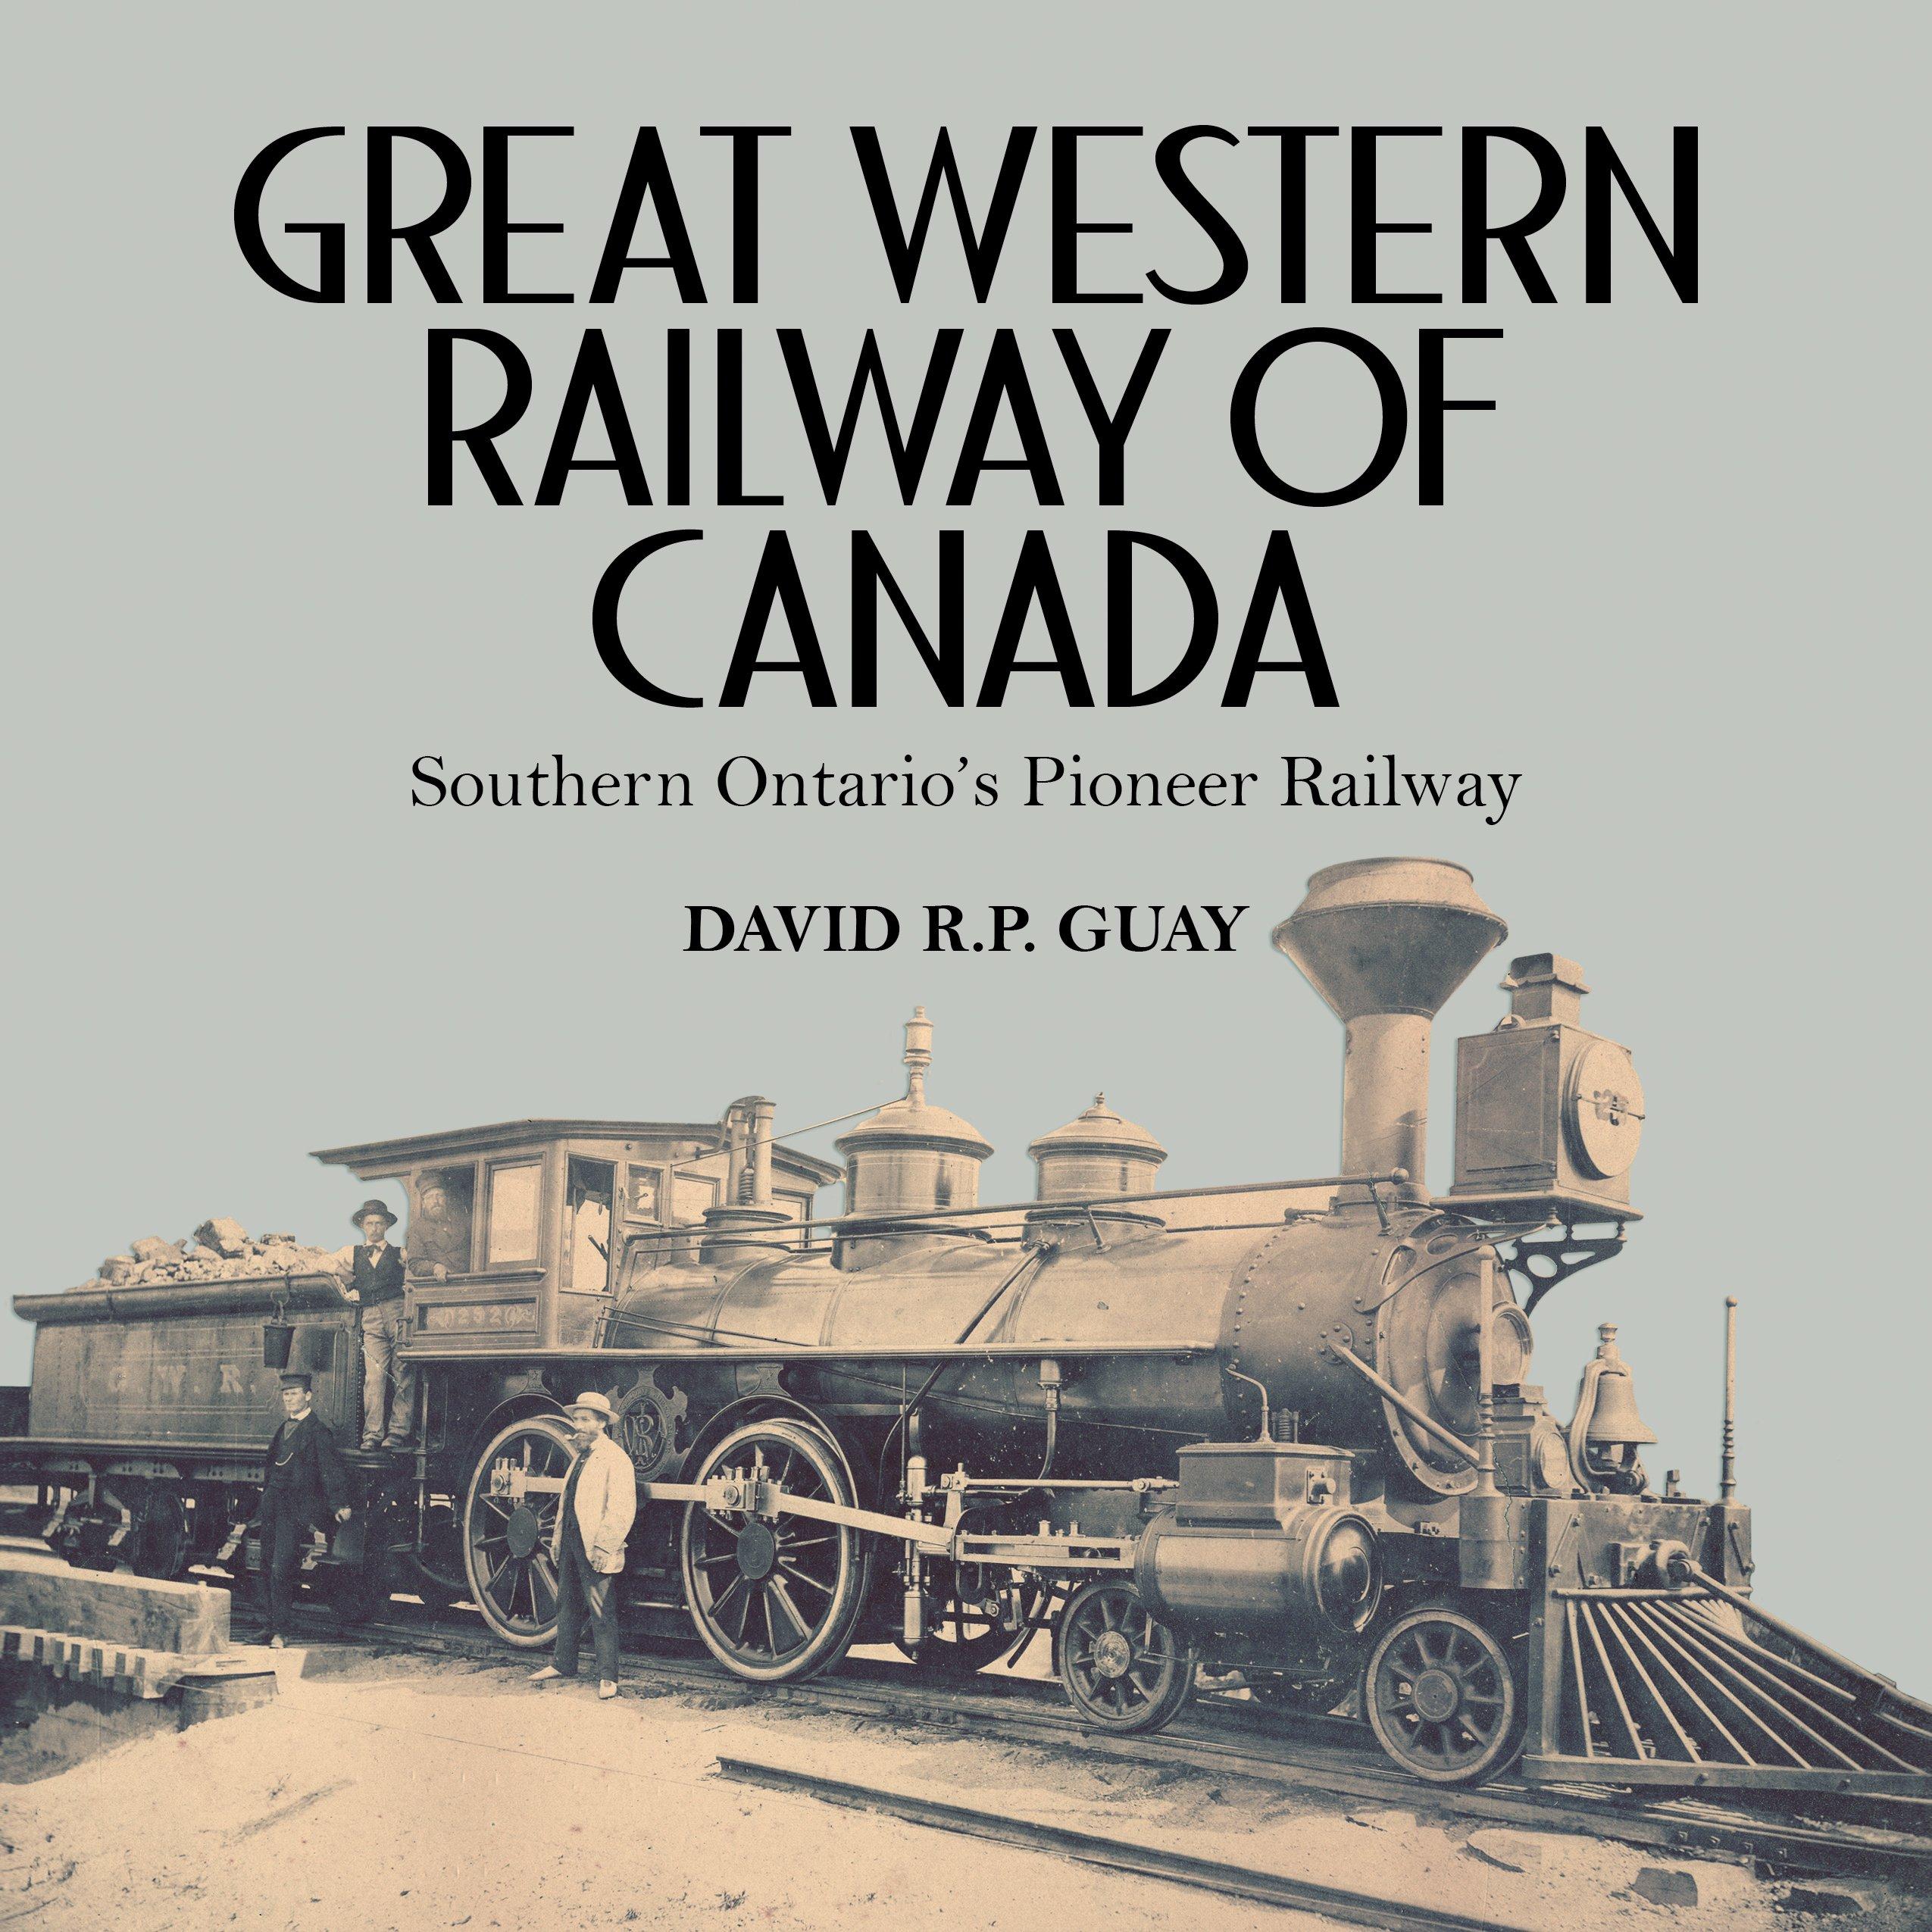 Great Western Railway of Canada: Southern Ontario's Pioneer Railway: Guay,  David R.P.: 9781459732827: Amazon.com: Books